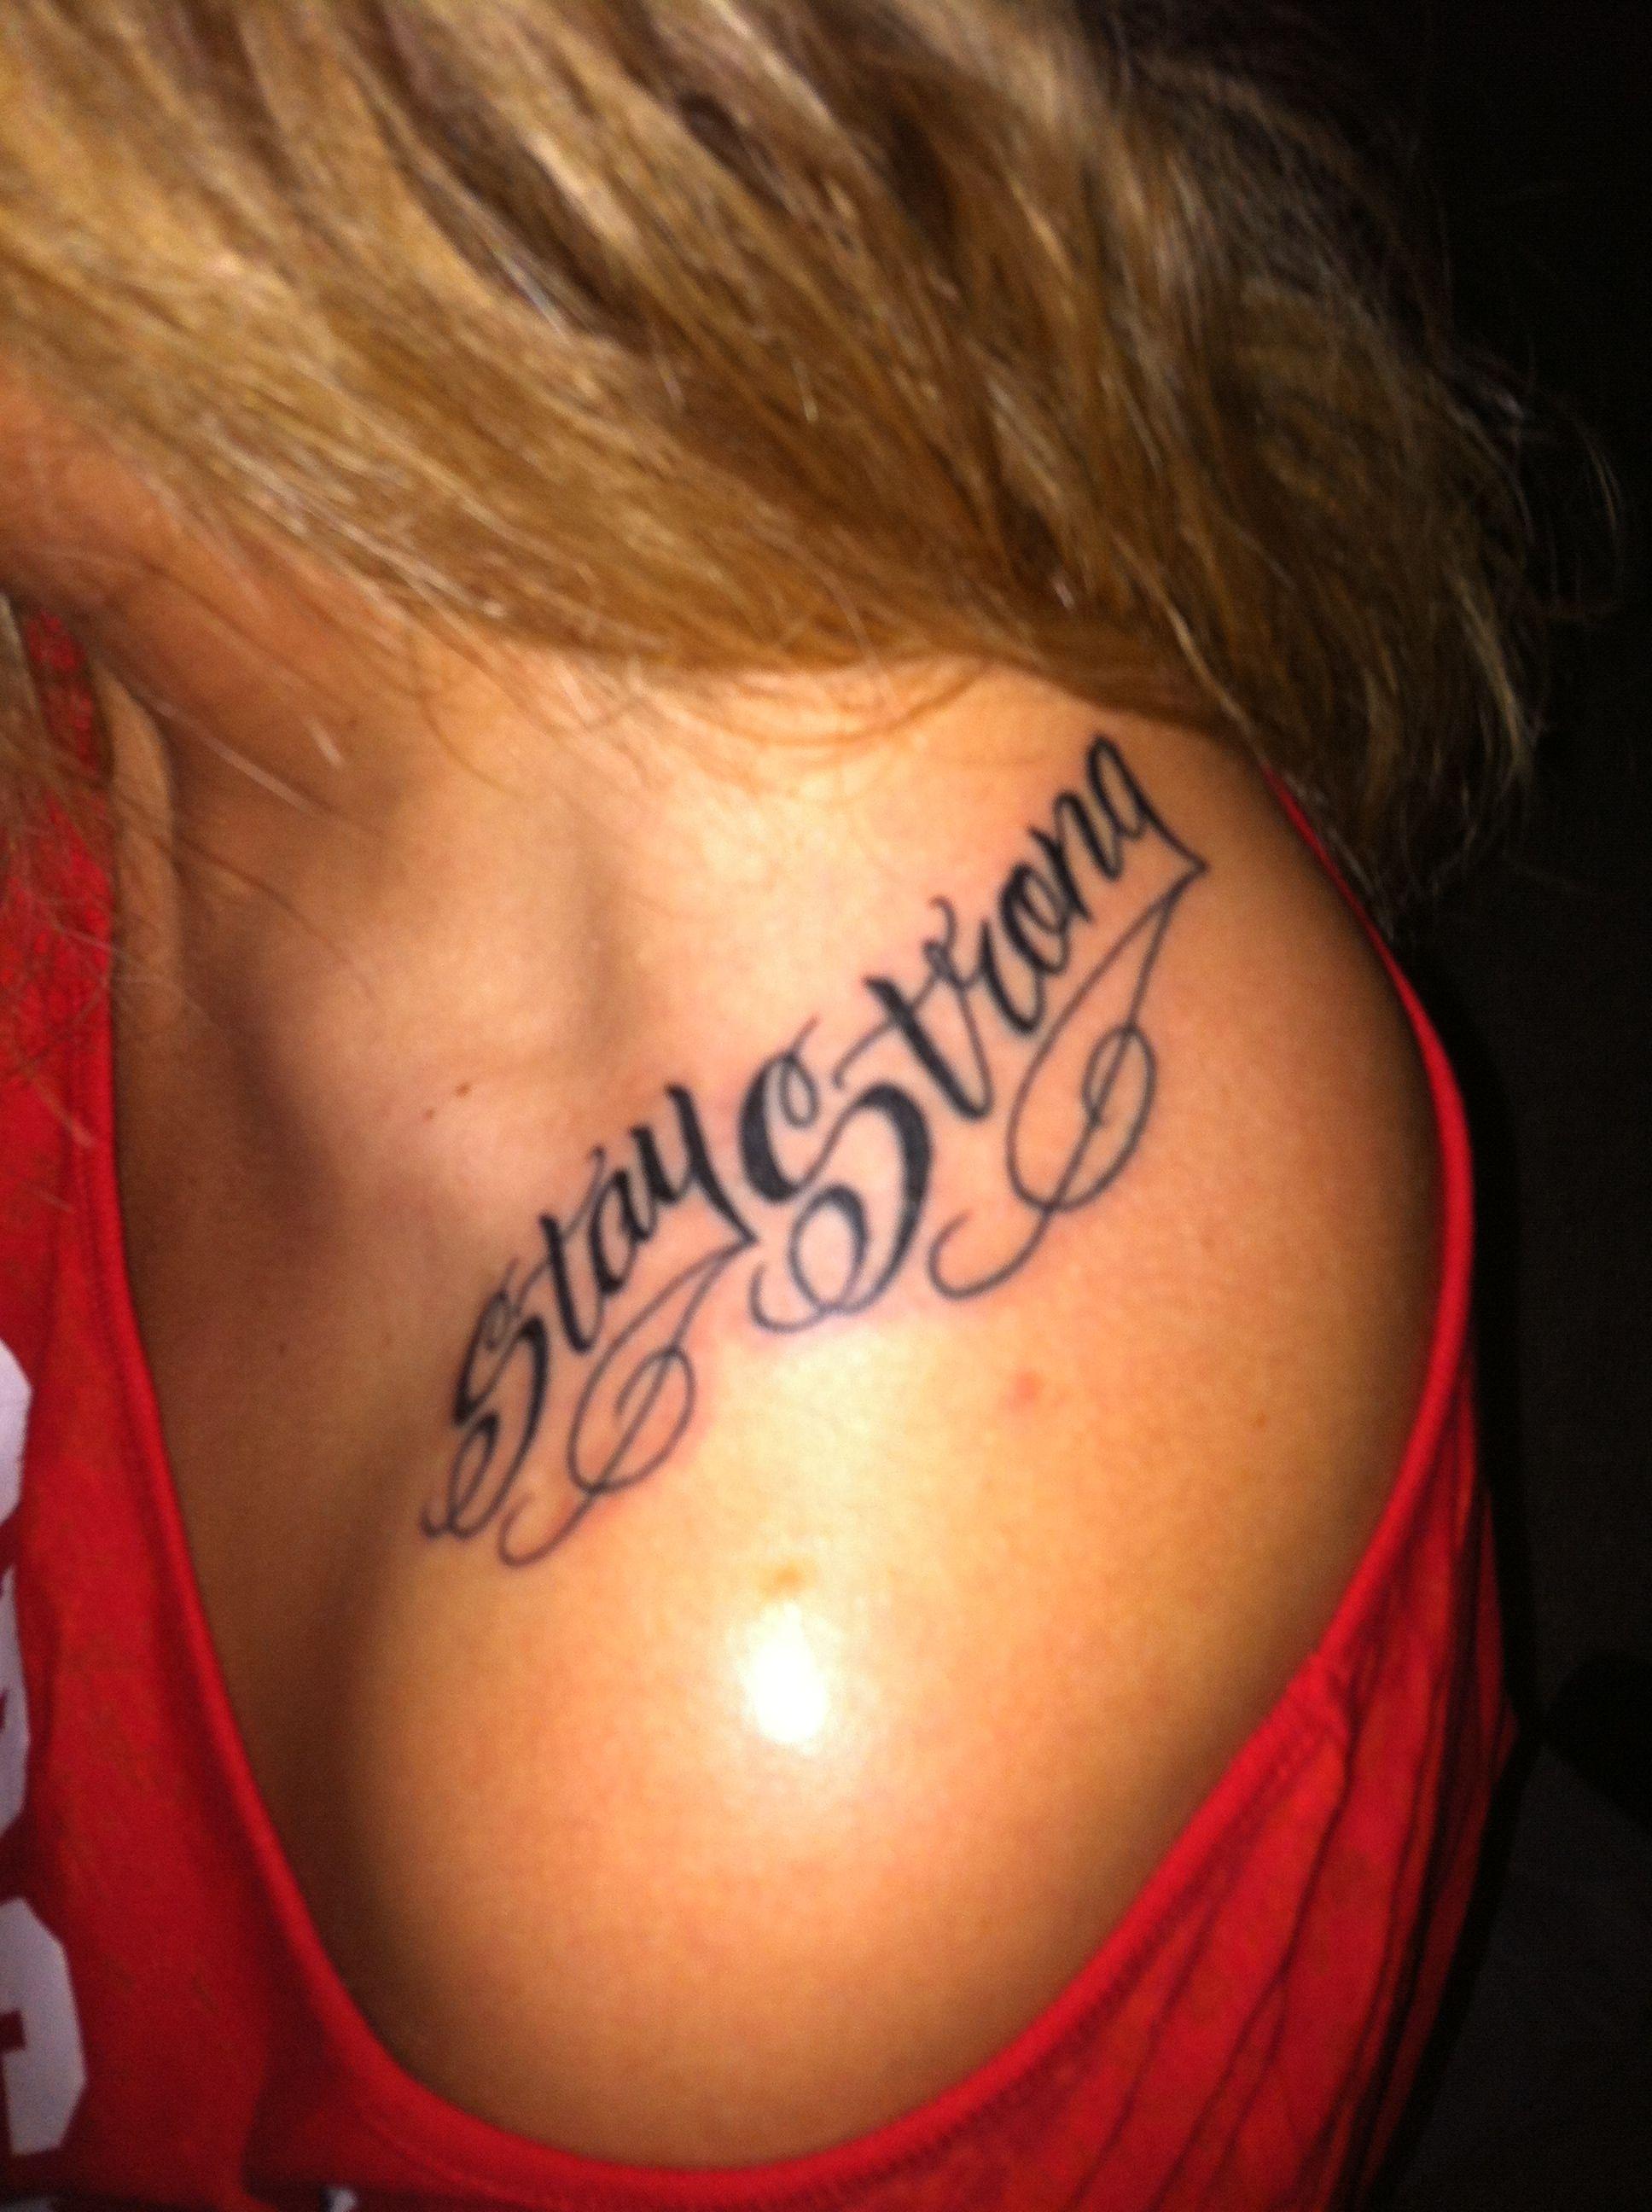 Stay strong tattoo | xoxoxo . | Pinterest